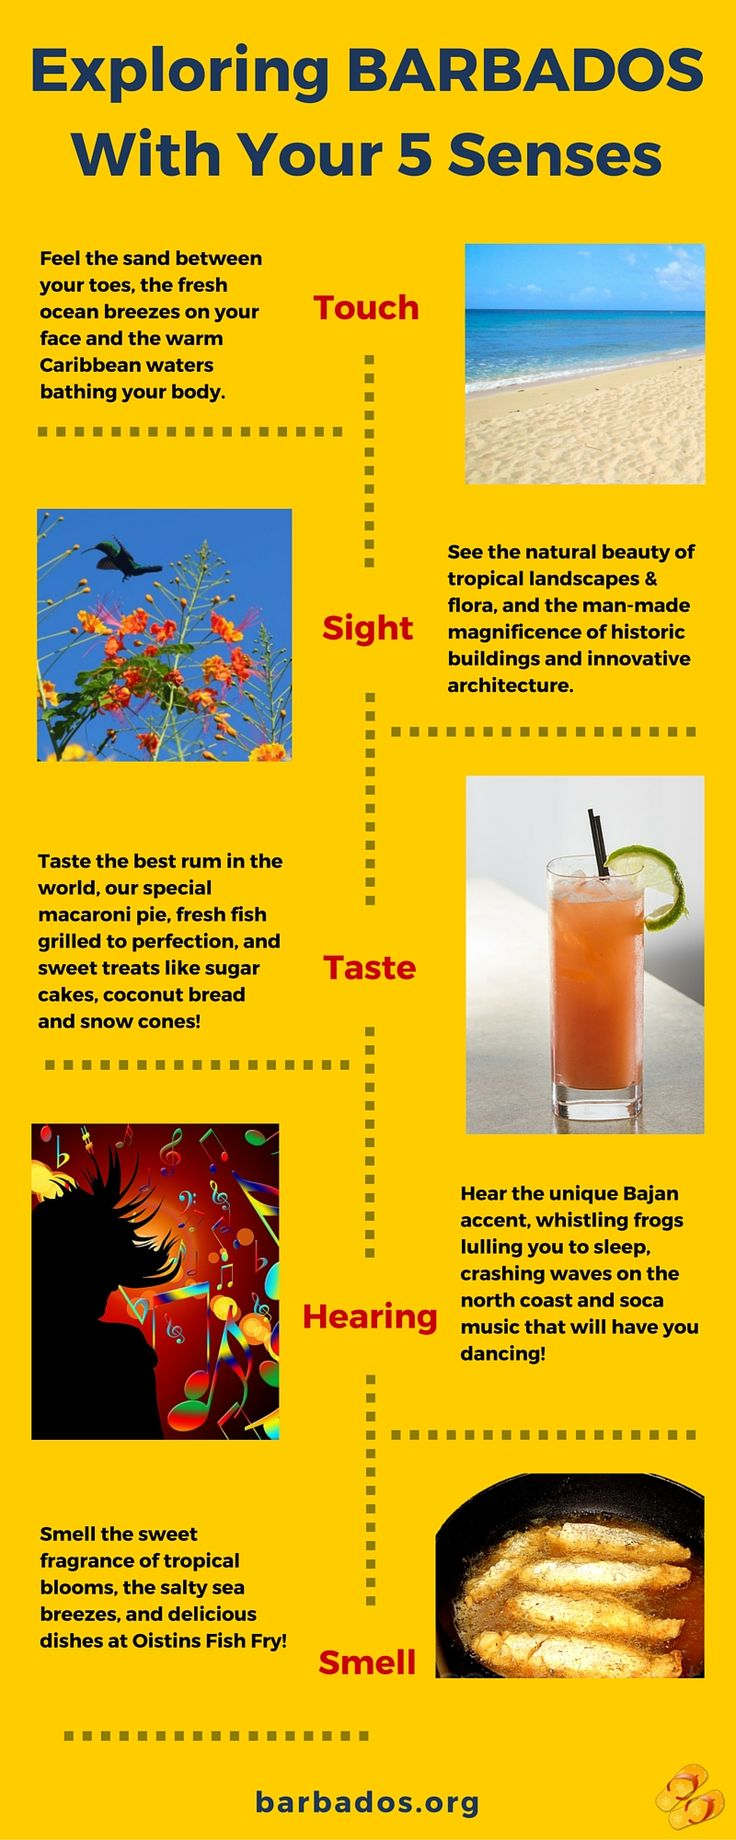 Explore #Barbados with your 5 senses!